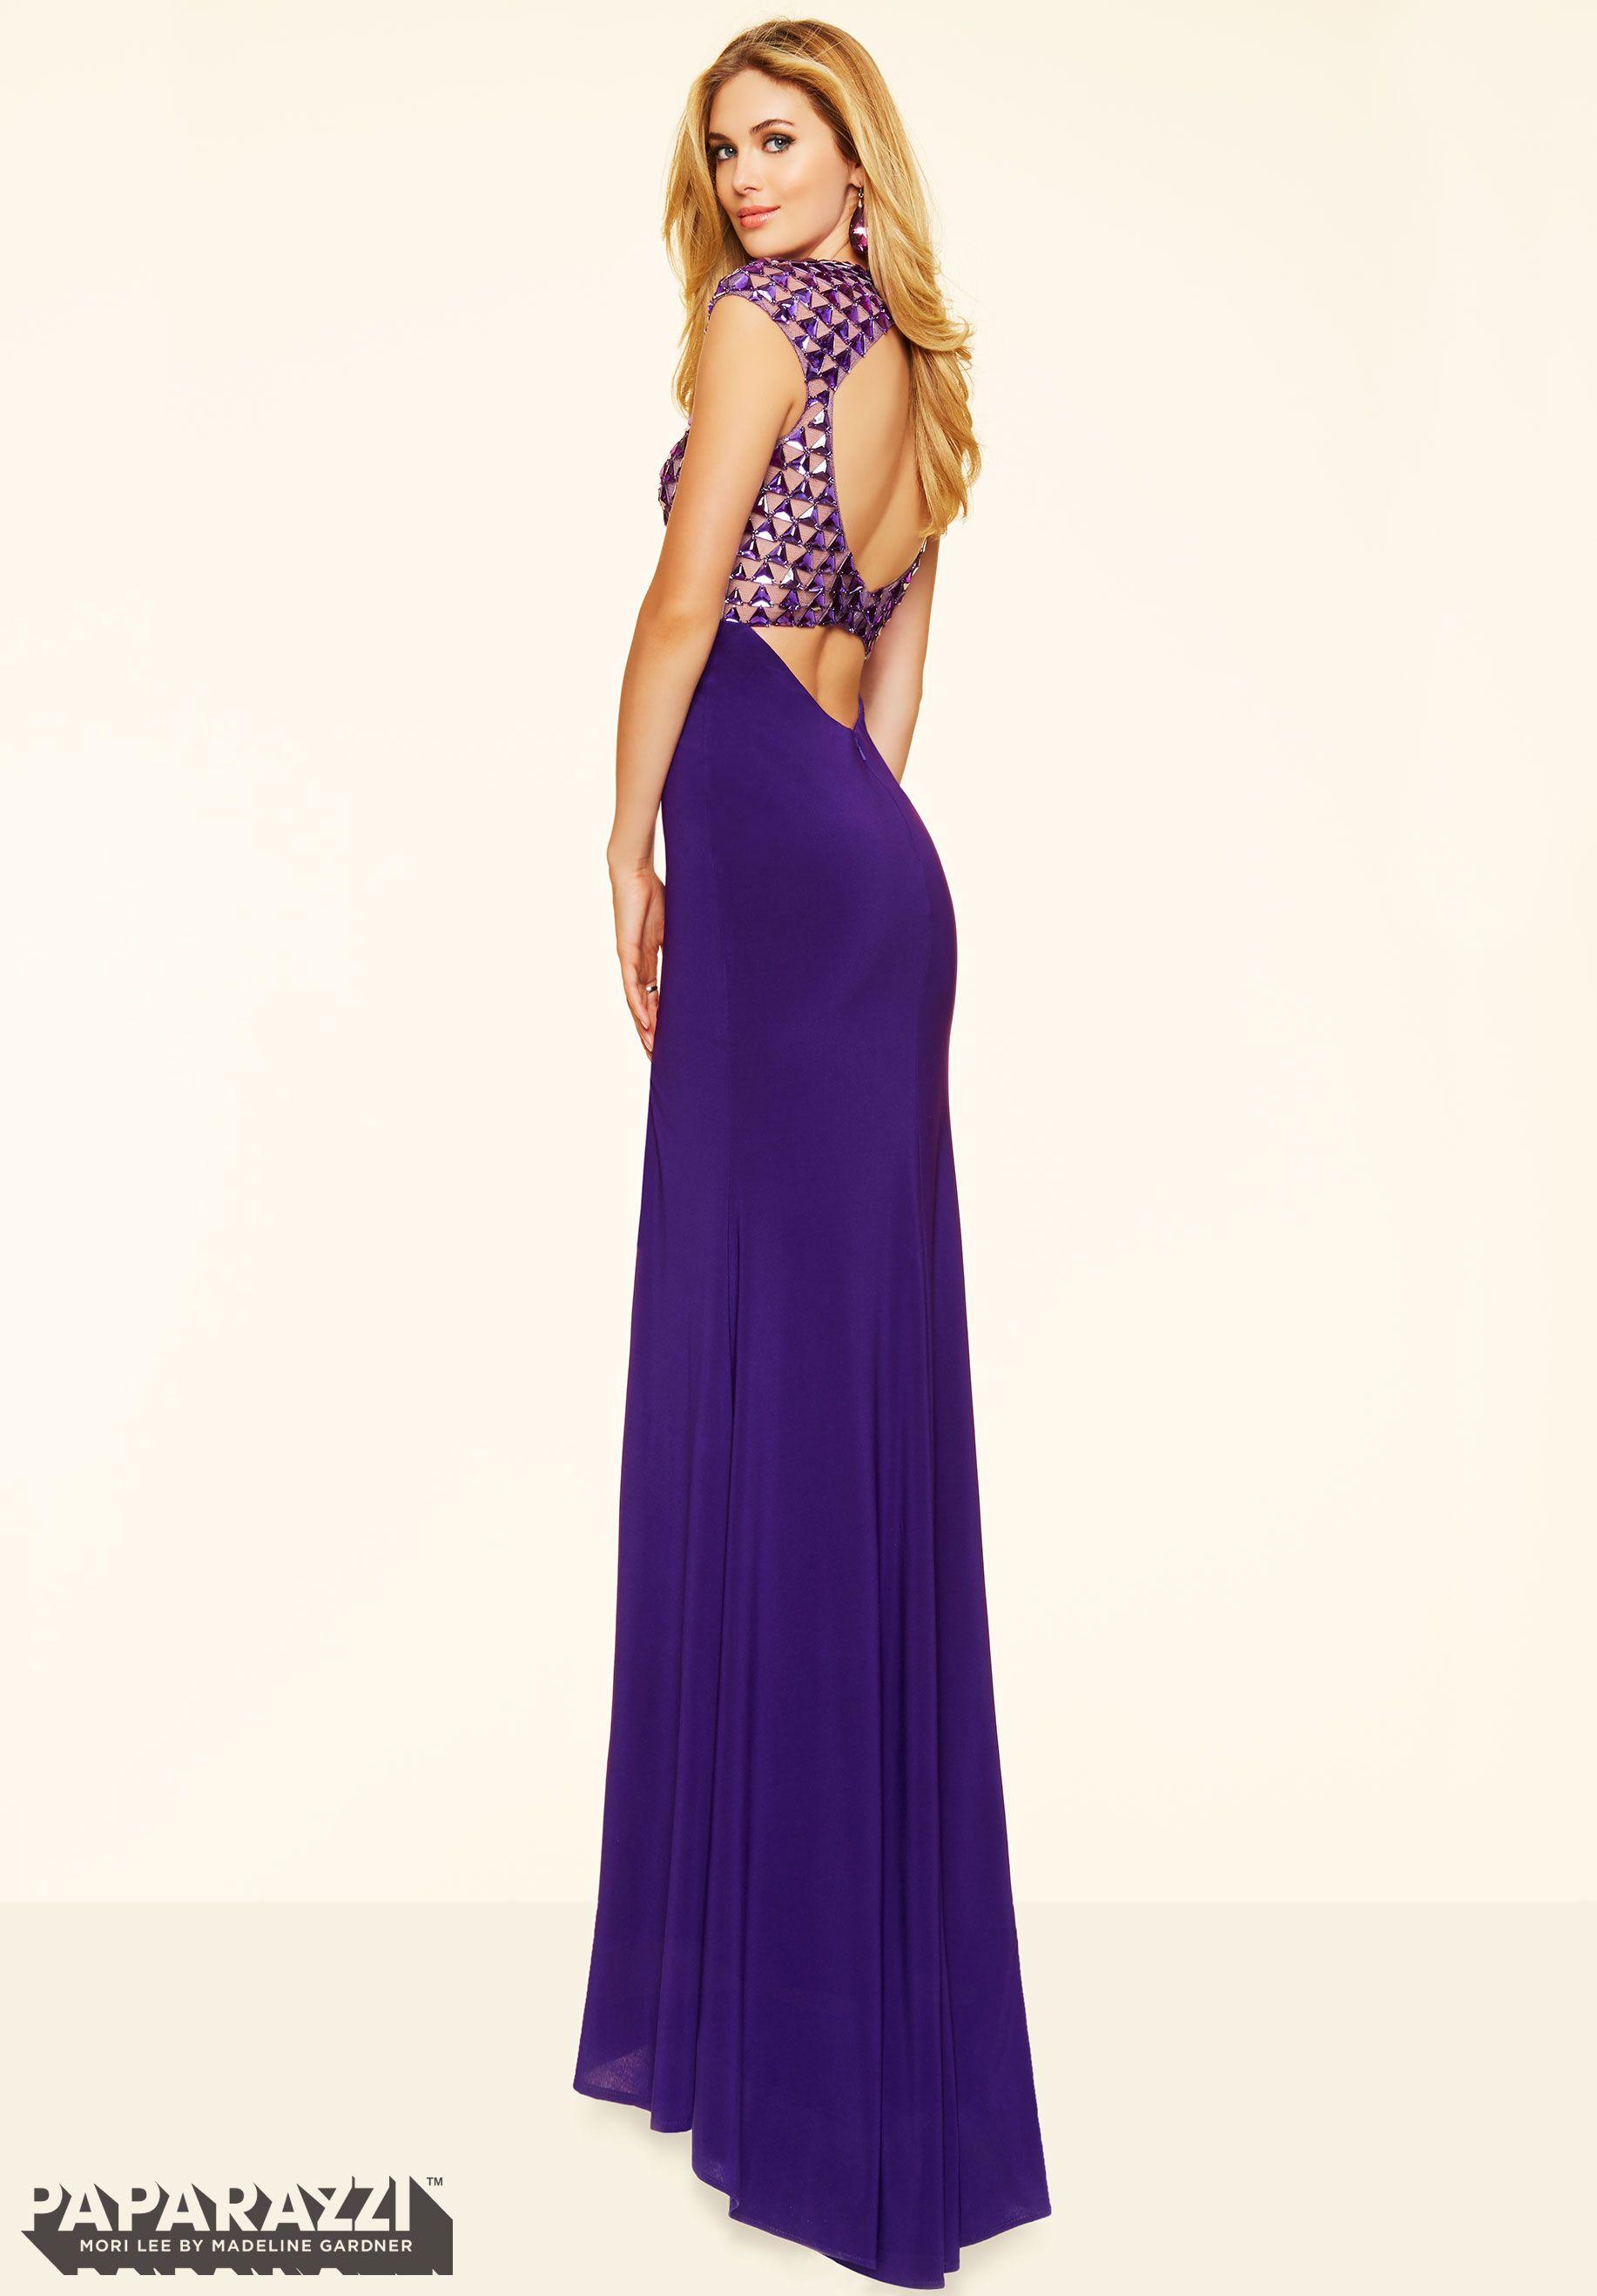 Prom Dresses by Paparazzi Prom - Dress Style 98025 | PROM | Pinterest